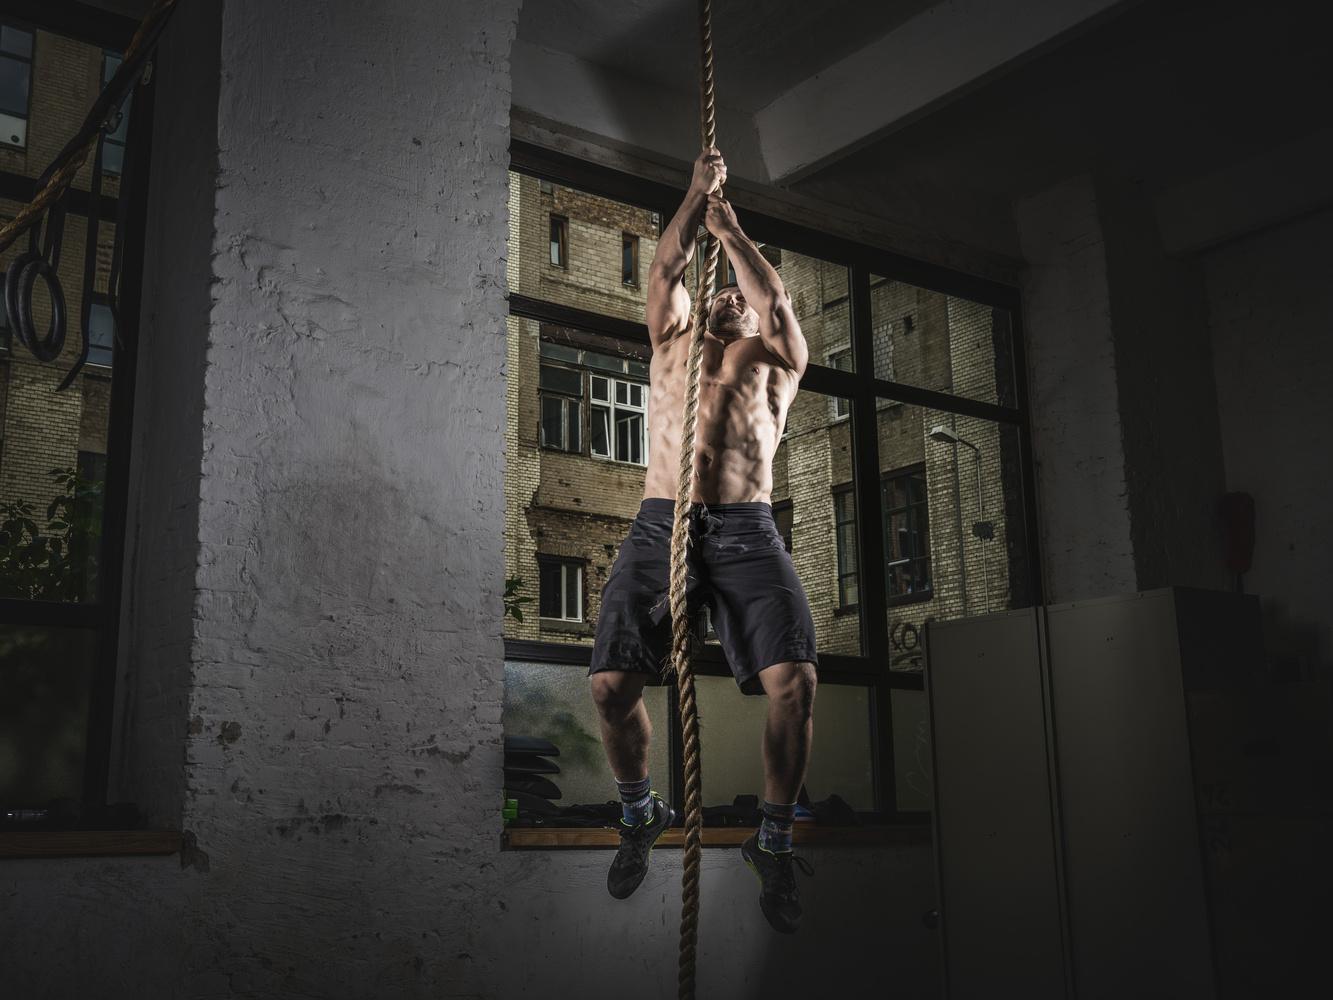 Rope Climb by Moritz Ullrich